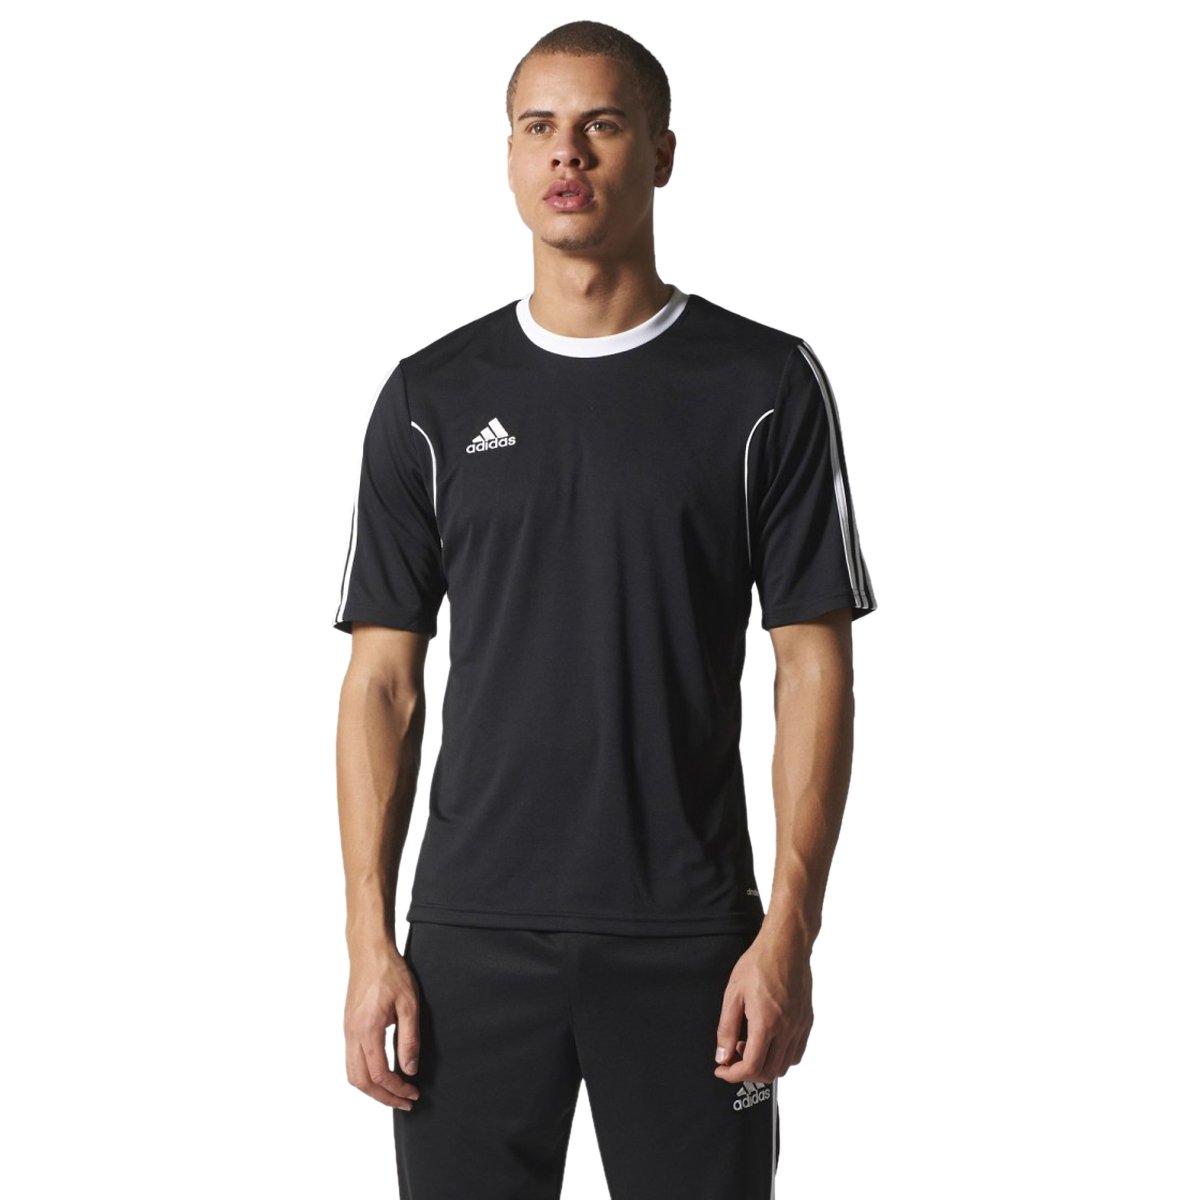 91e51383e7 Bizz Store - Camiseta Masculina Adidas Squadra 13 Futebol Preta